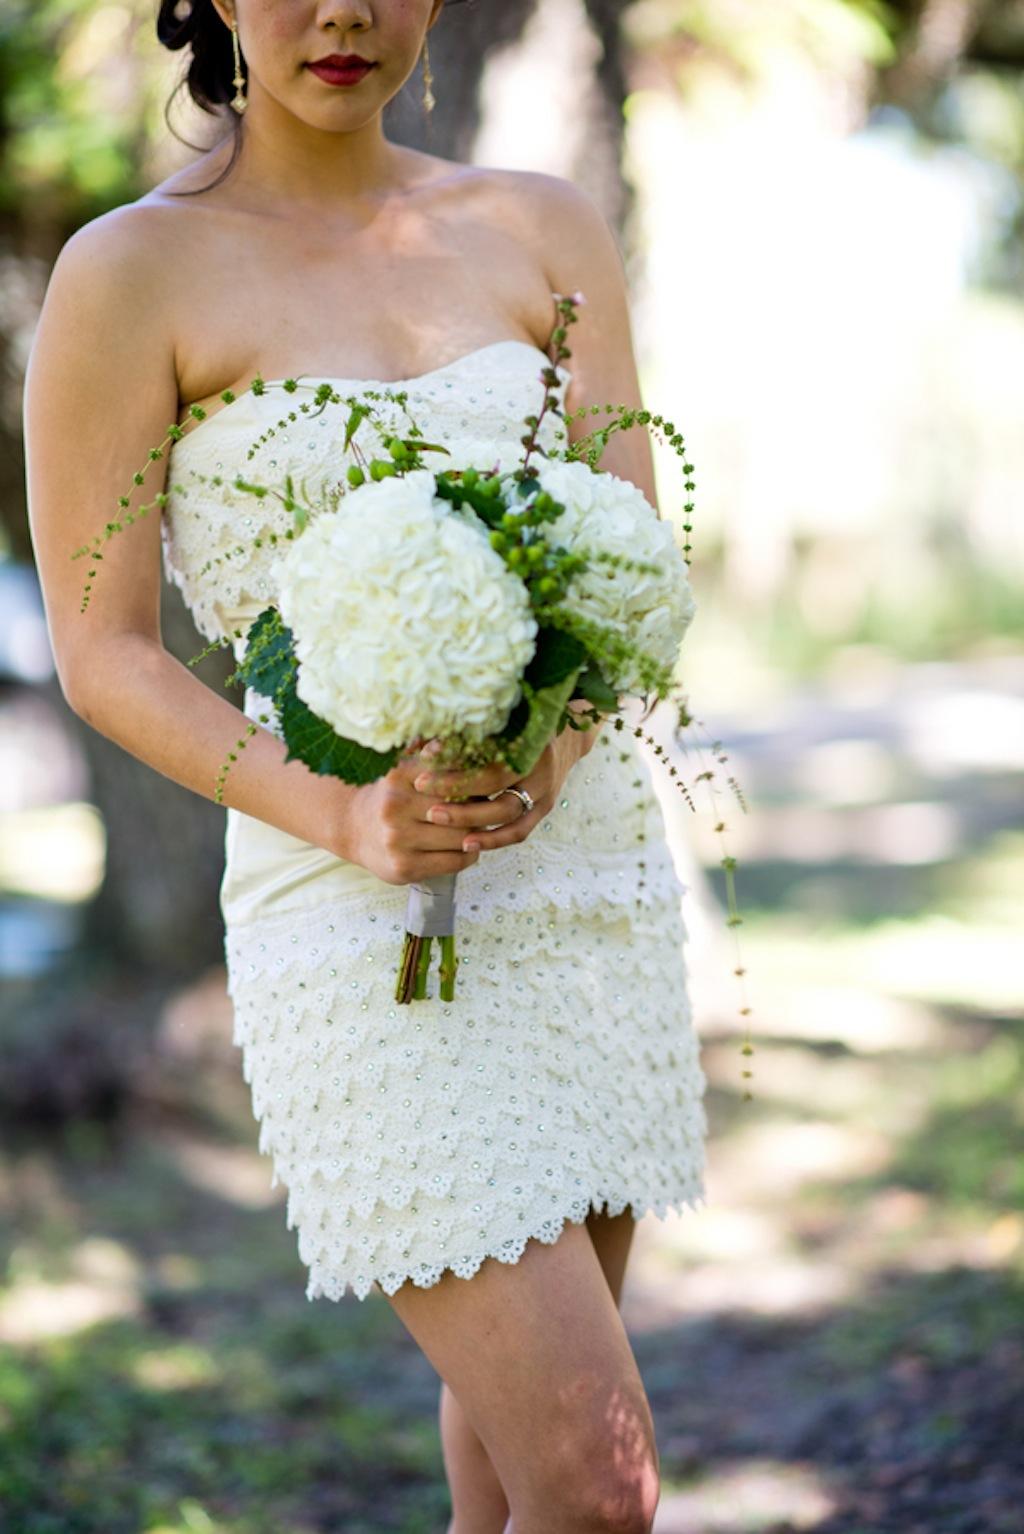 White Wedding Bouquet with Short White Wedding Dress   Vintage, Garden Wedding Styled Shoot